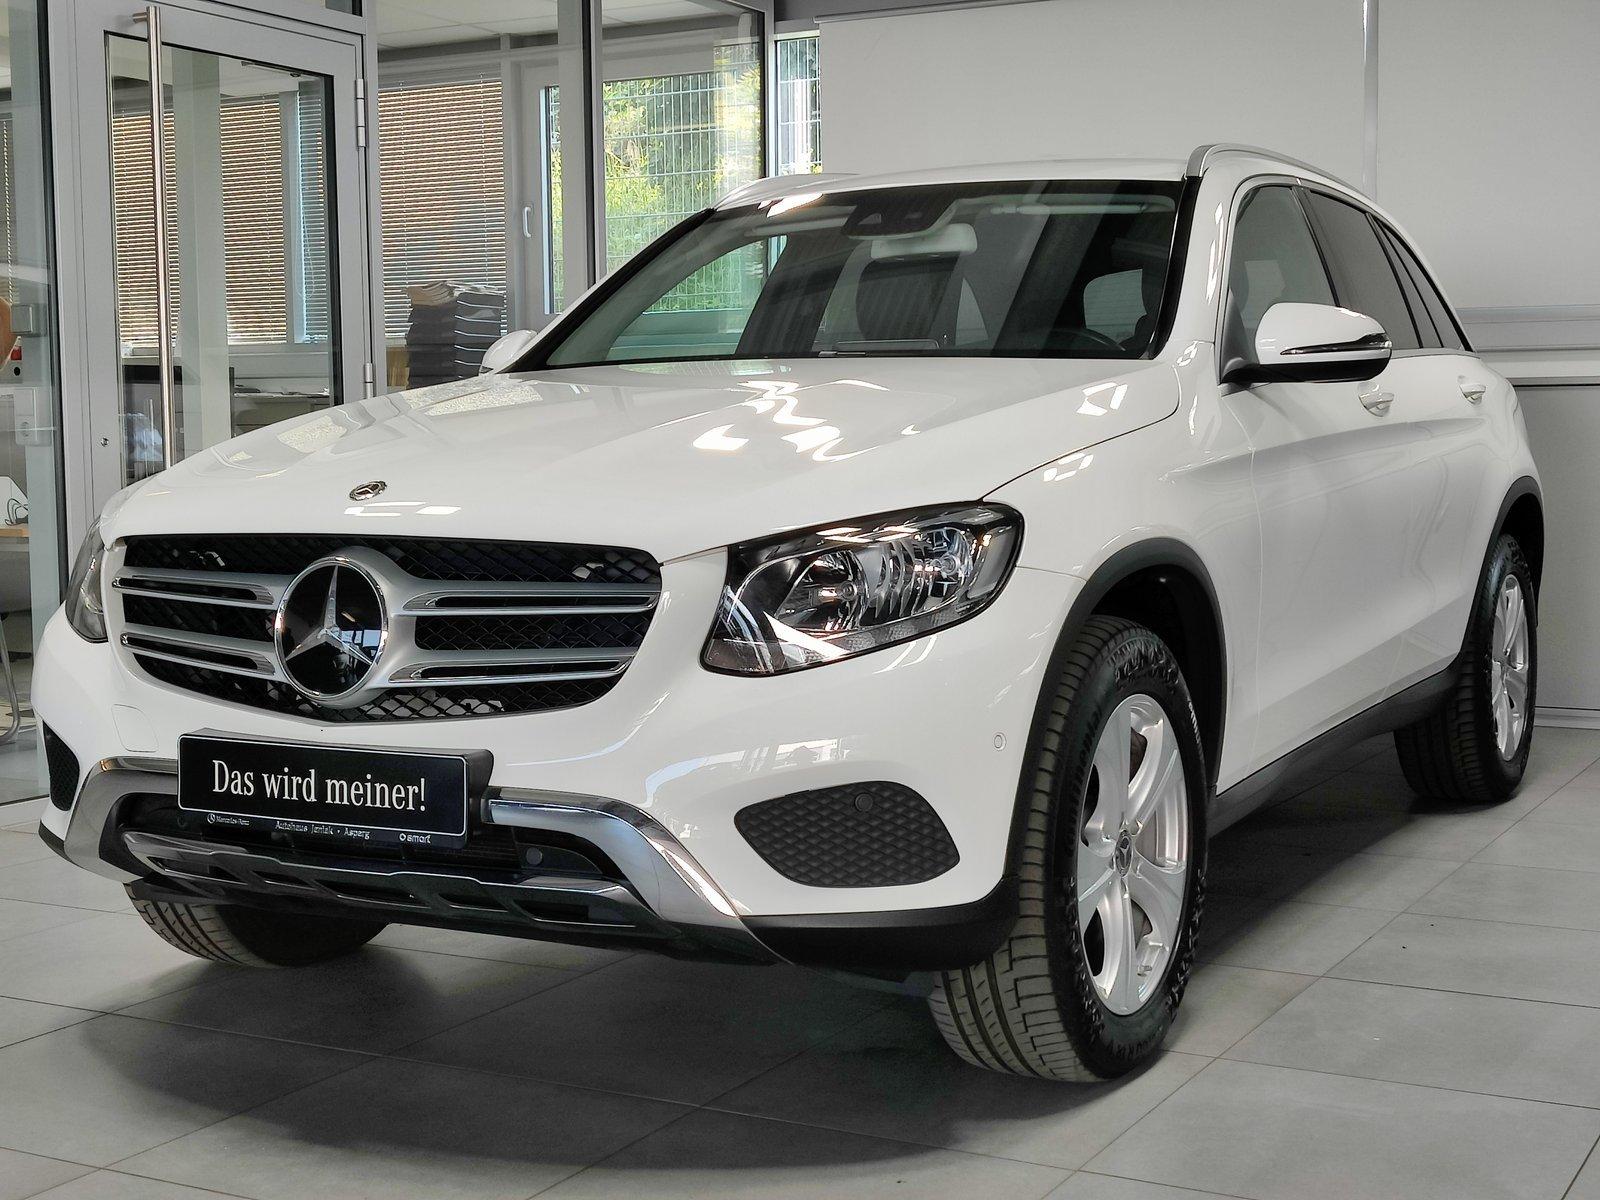 Mercedes-Benz GLC 220d 4M OFF-ROAD|AHK|Distronic+|Comand|PDC, Jahr 2017, Diesel